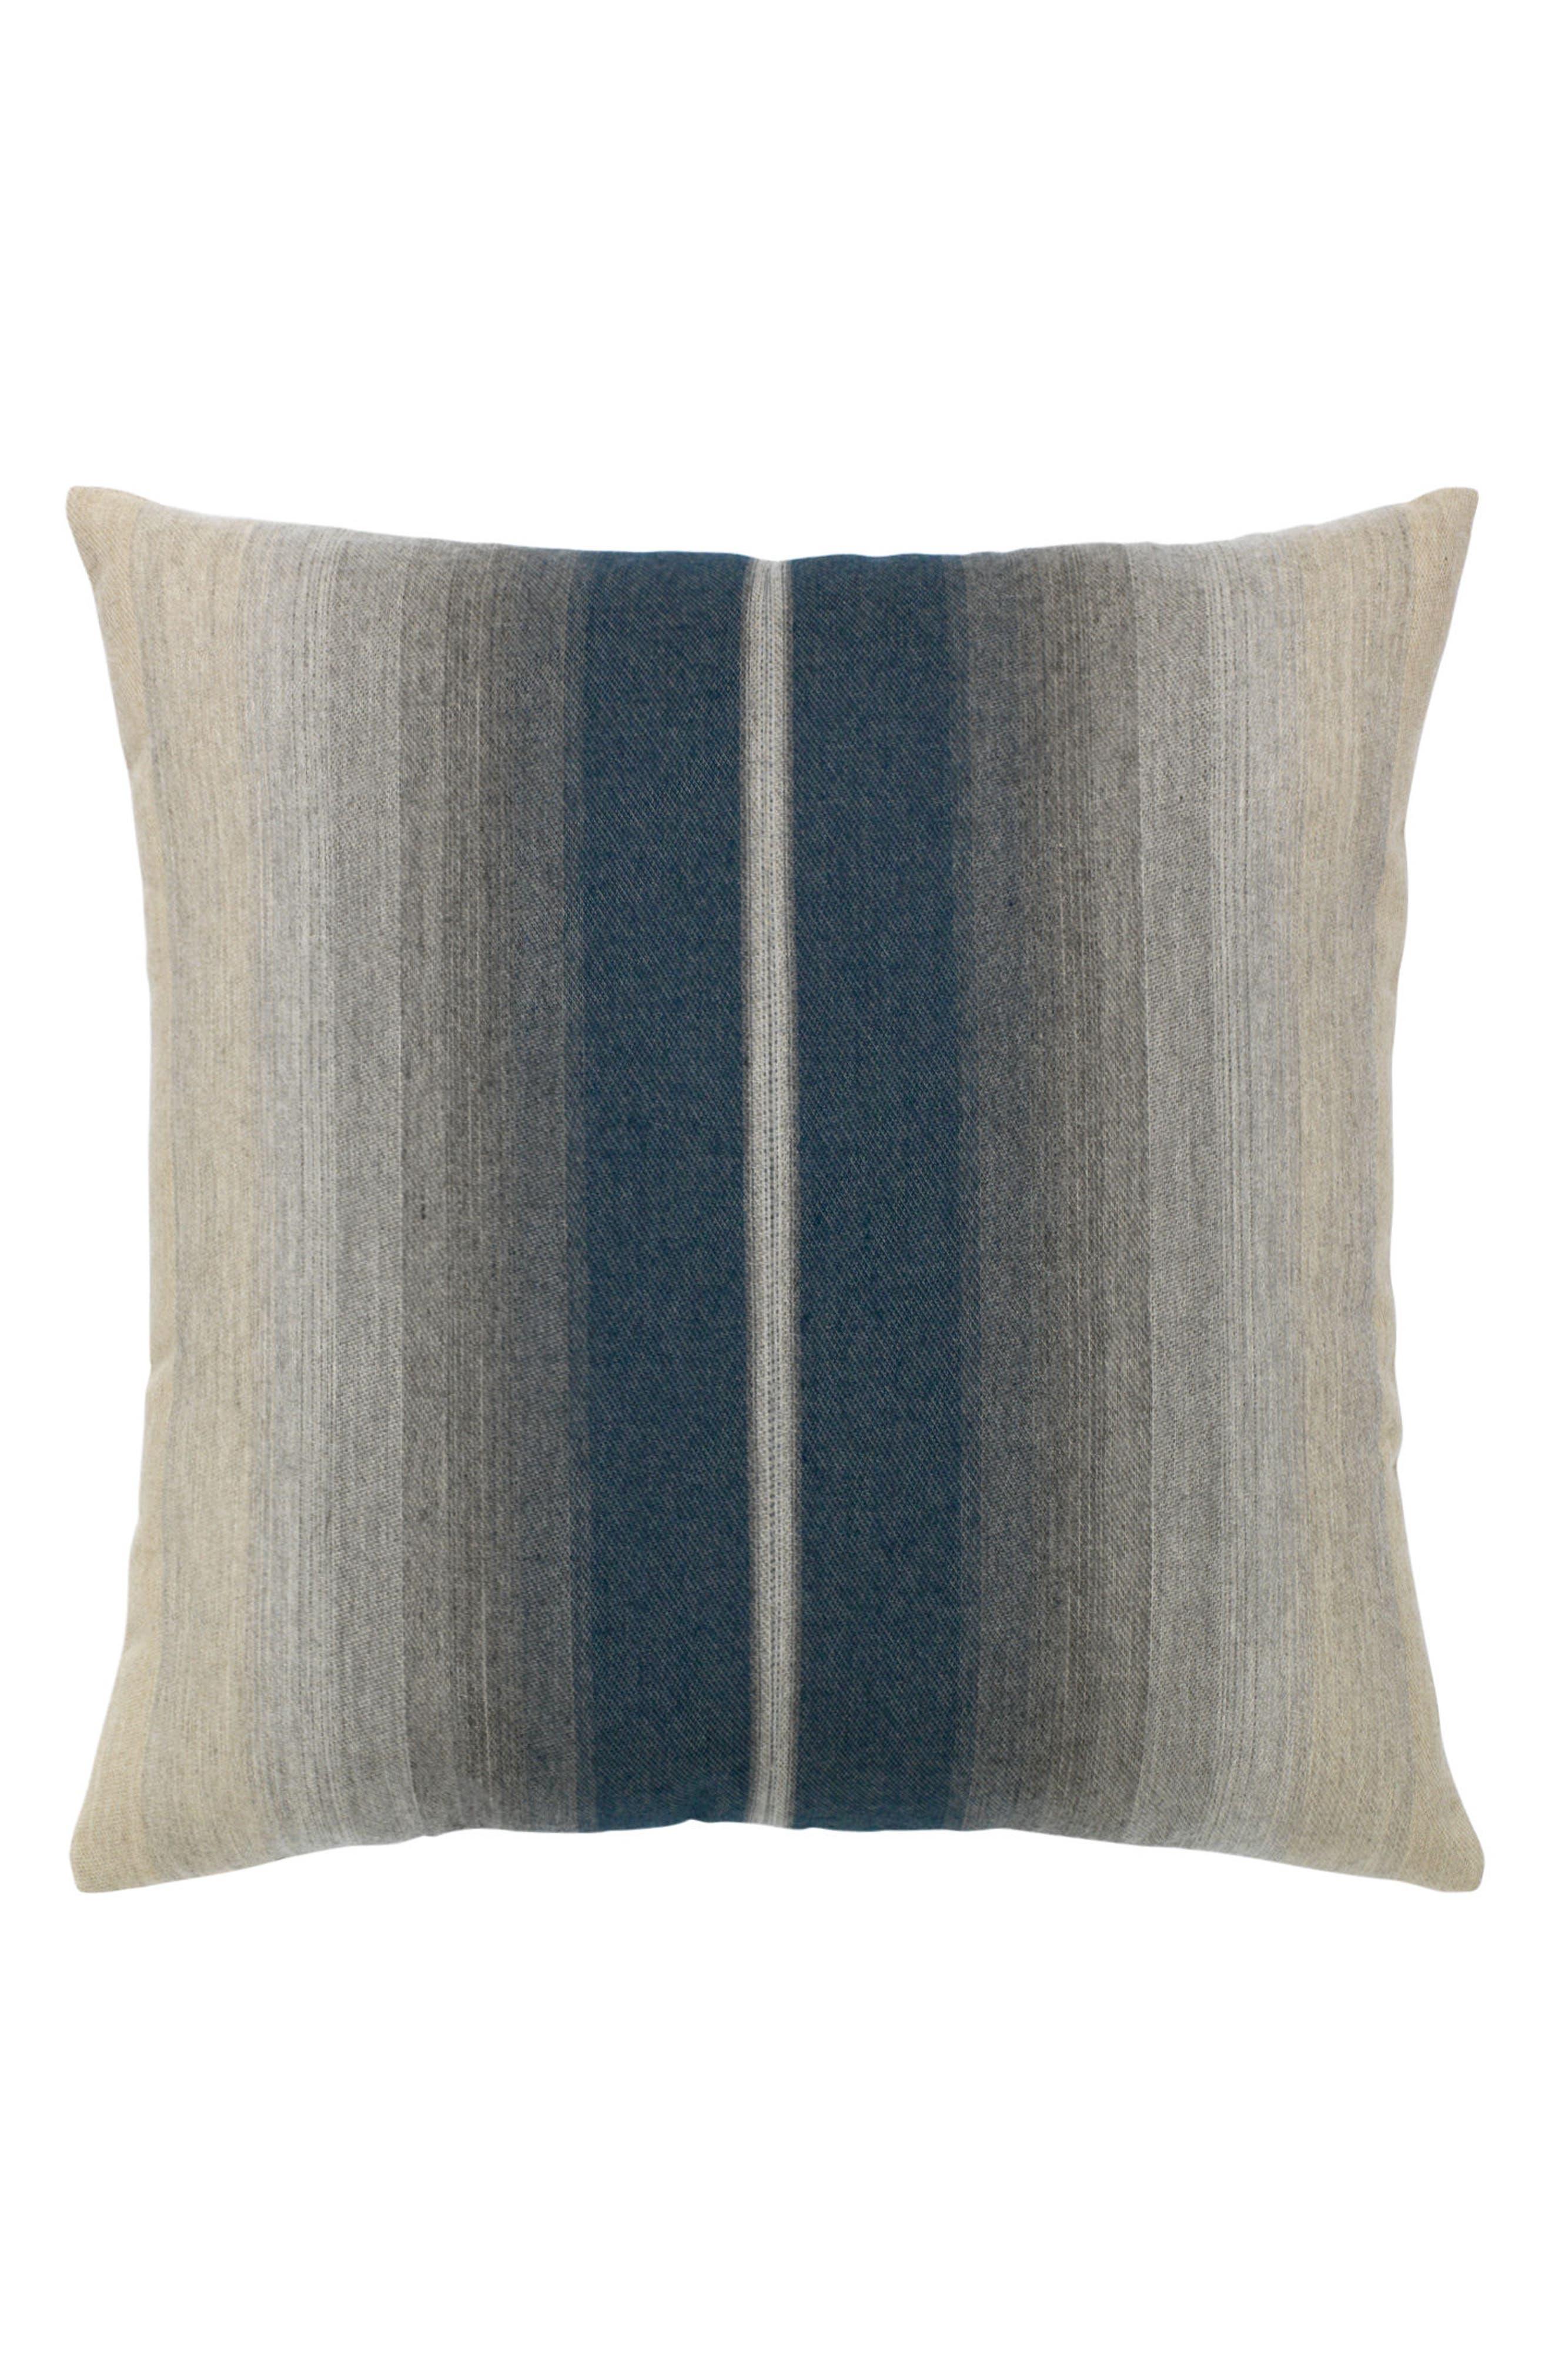 Ombré Indigo Indoor/Outdoor Accent Pillow,                             Main thumbnail 1, color,                             400